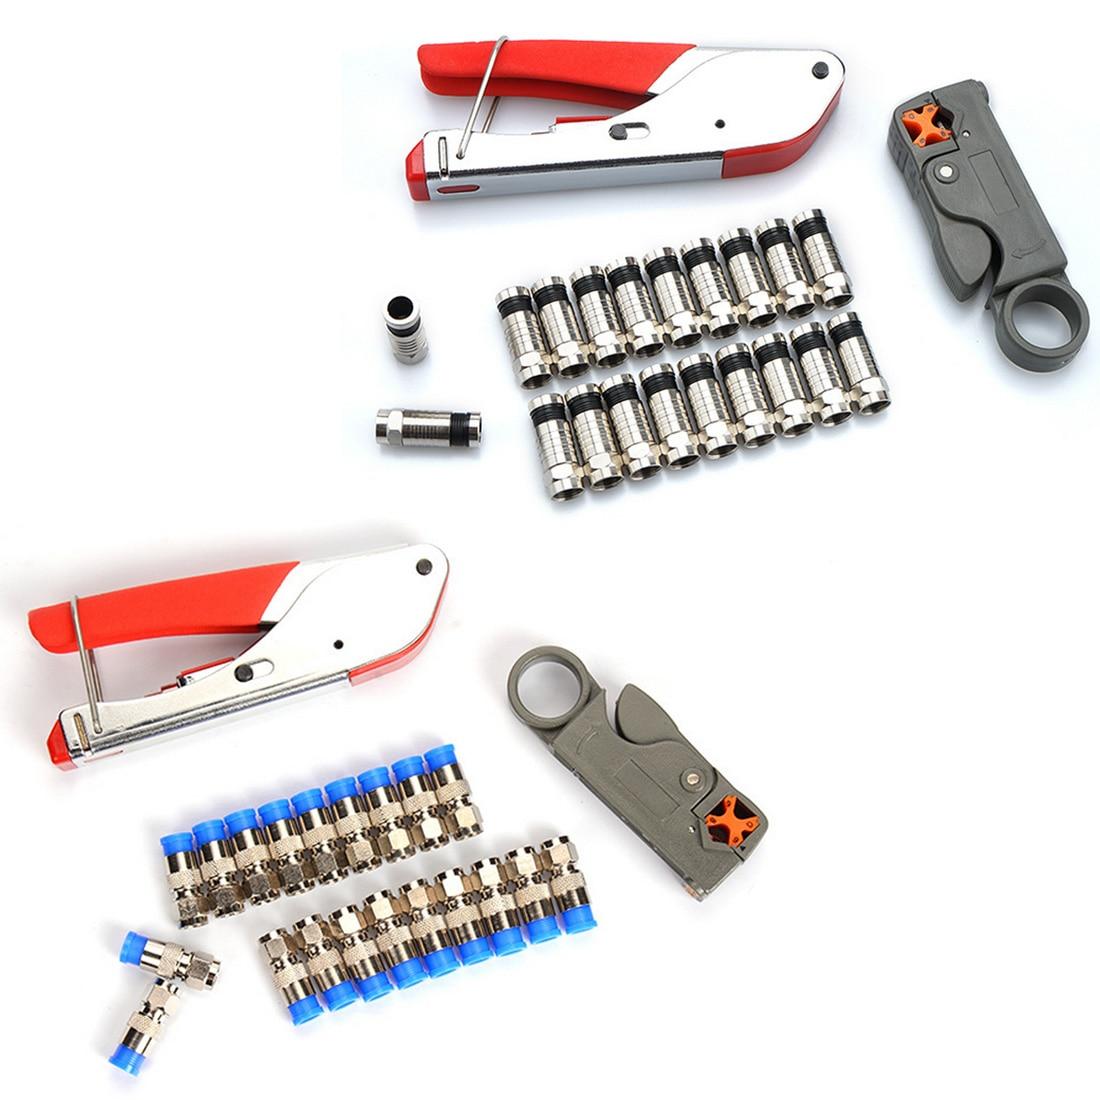 Conjunto Coaxial Cable Wire Stripper RG6 1/RG59 F 20 pcs Conector Ferramenta de Compressão de Friso Alicate de Arame Alicate Descascar kit